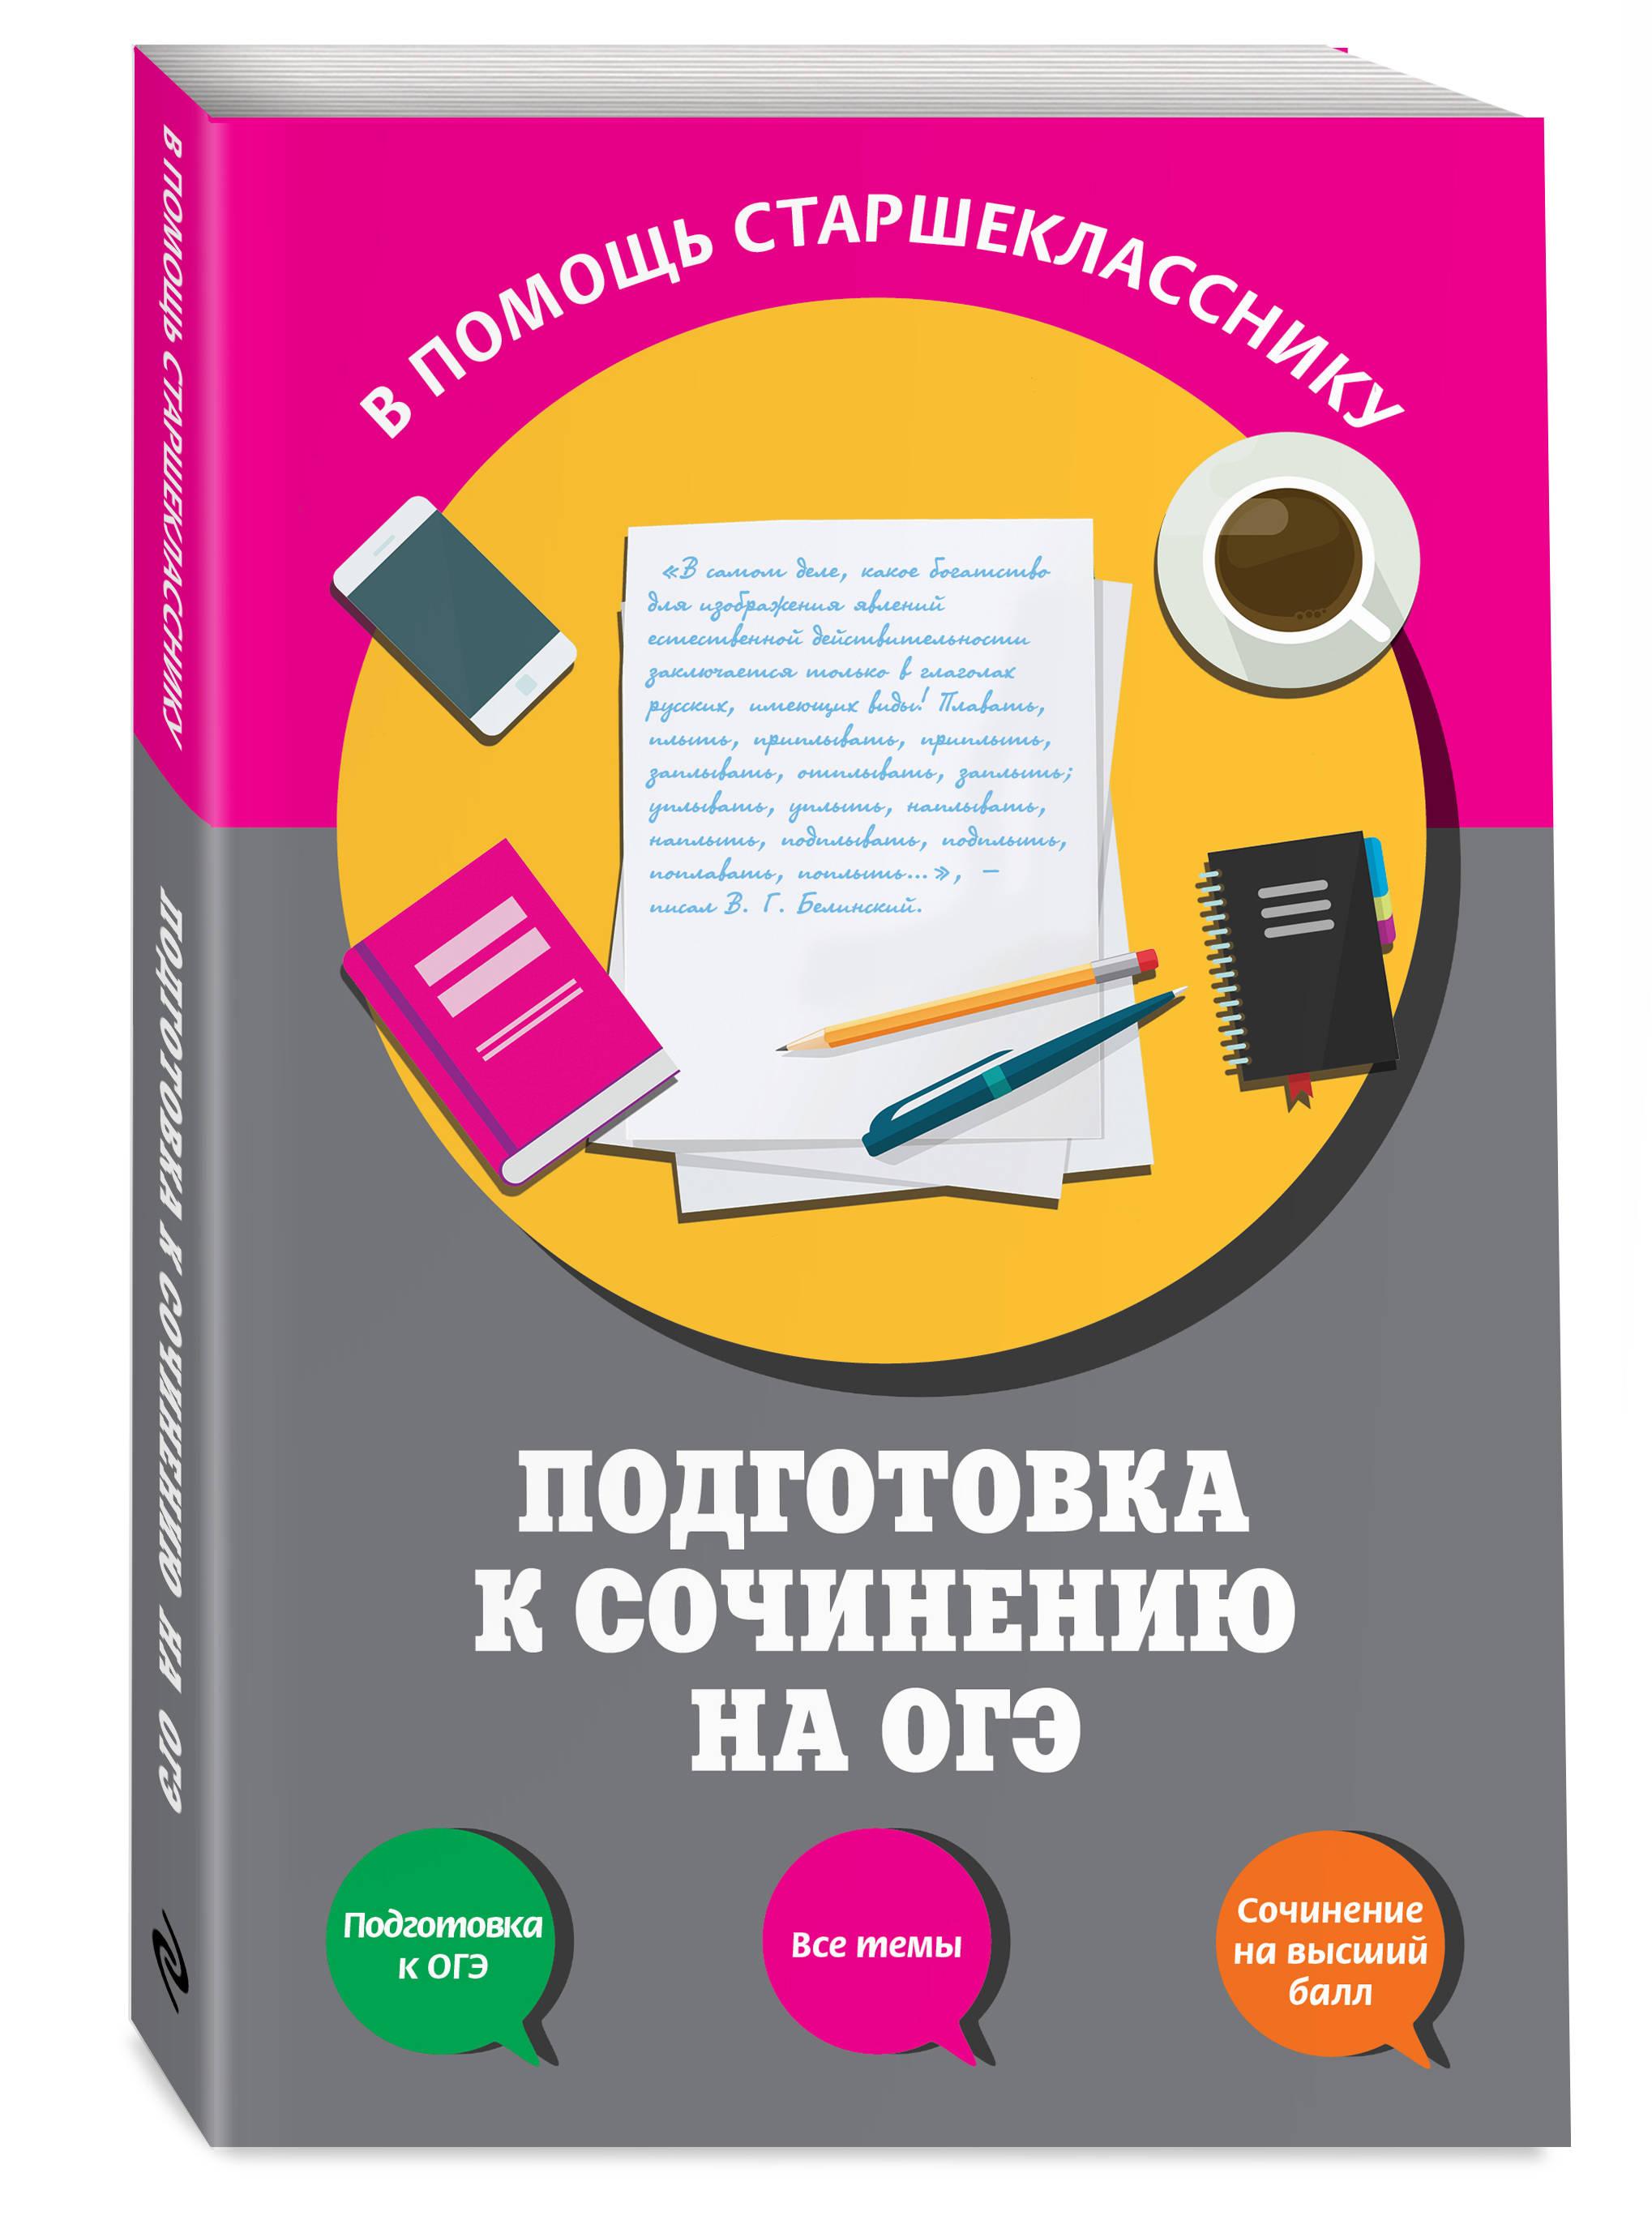 Подготовка к сочинению на ОГЭ ( Черкасова Л.Н., Попова Е.В.  )